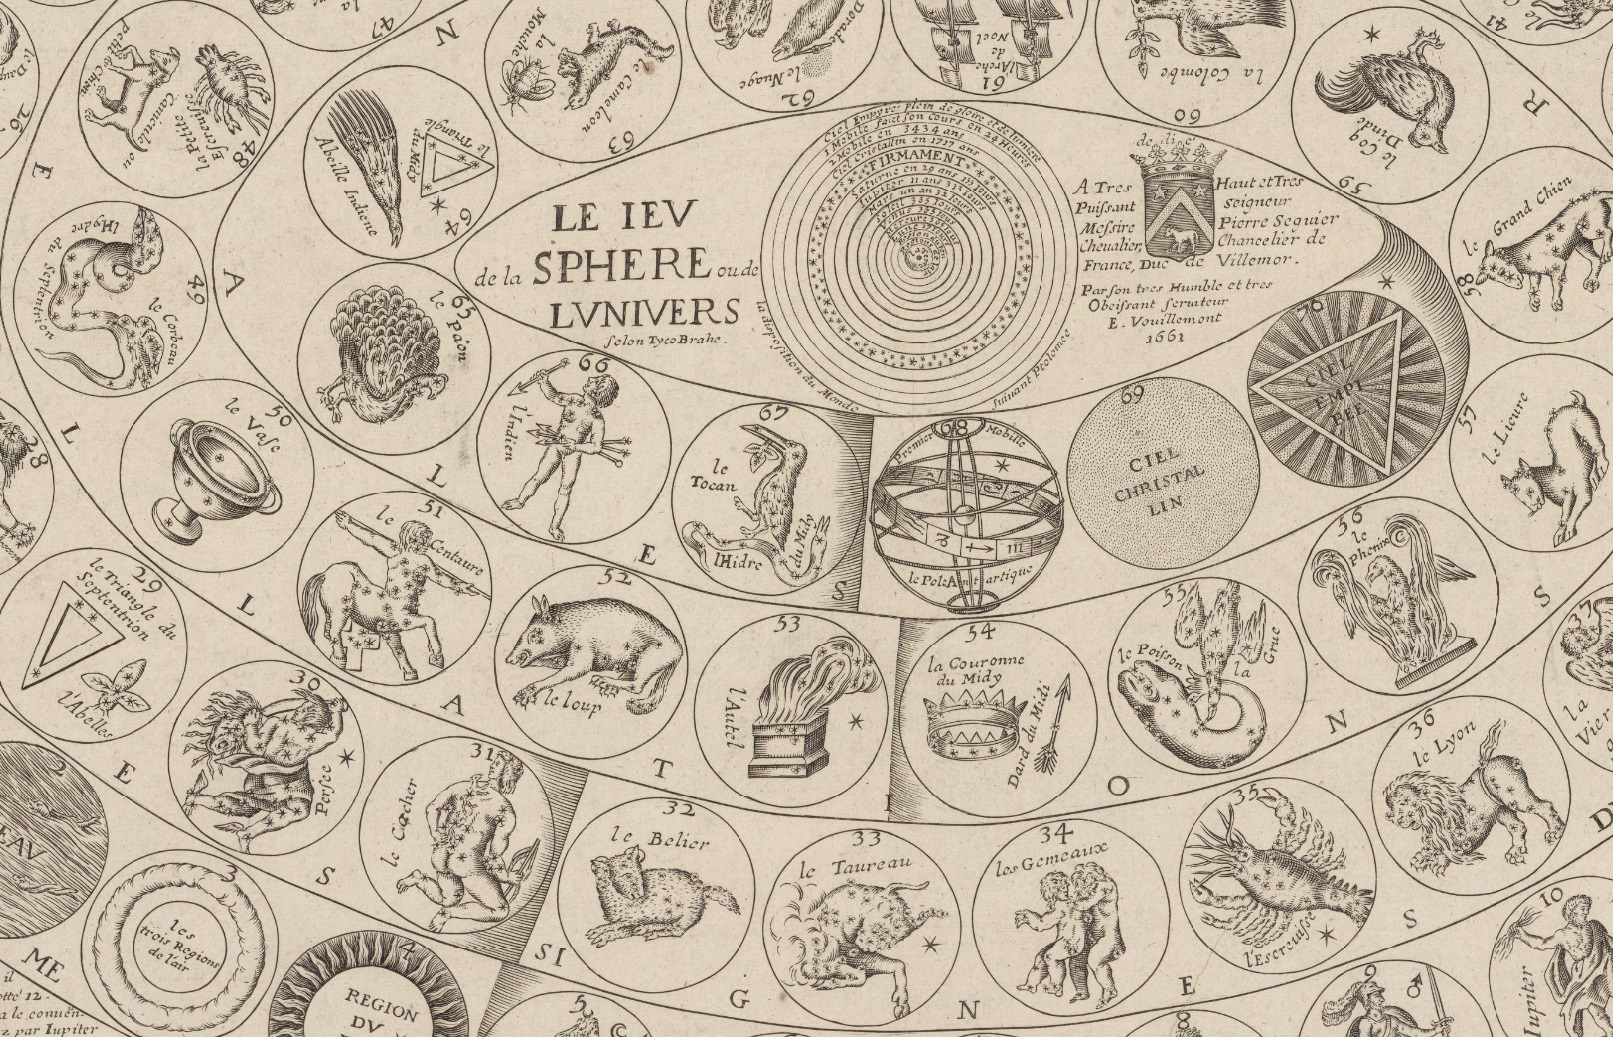 1661-71-jeu-de-la-sphere-det1.jpg